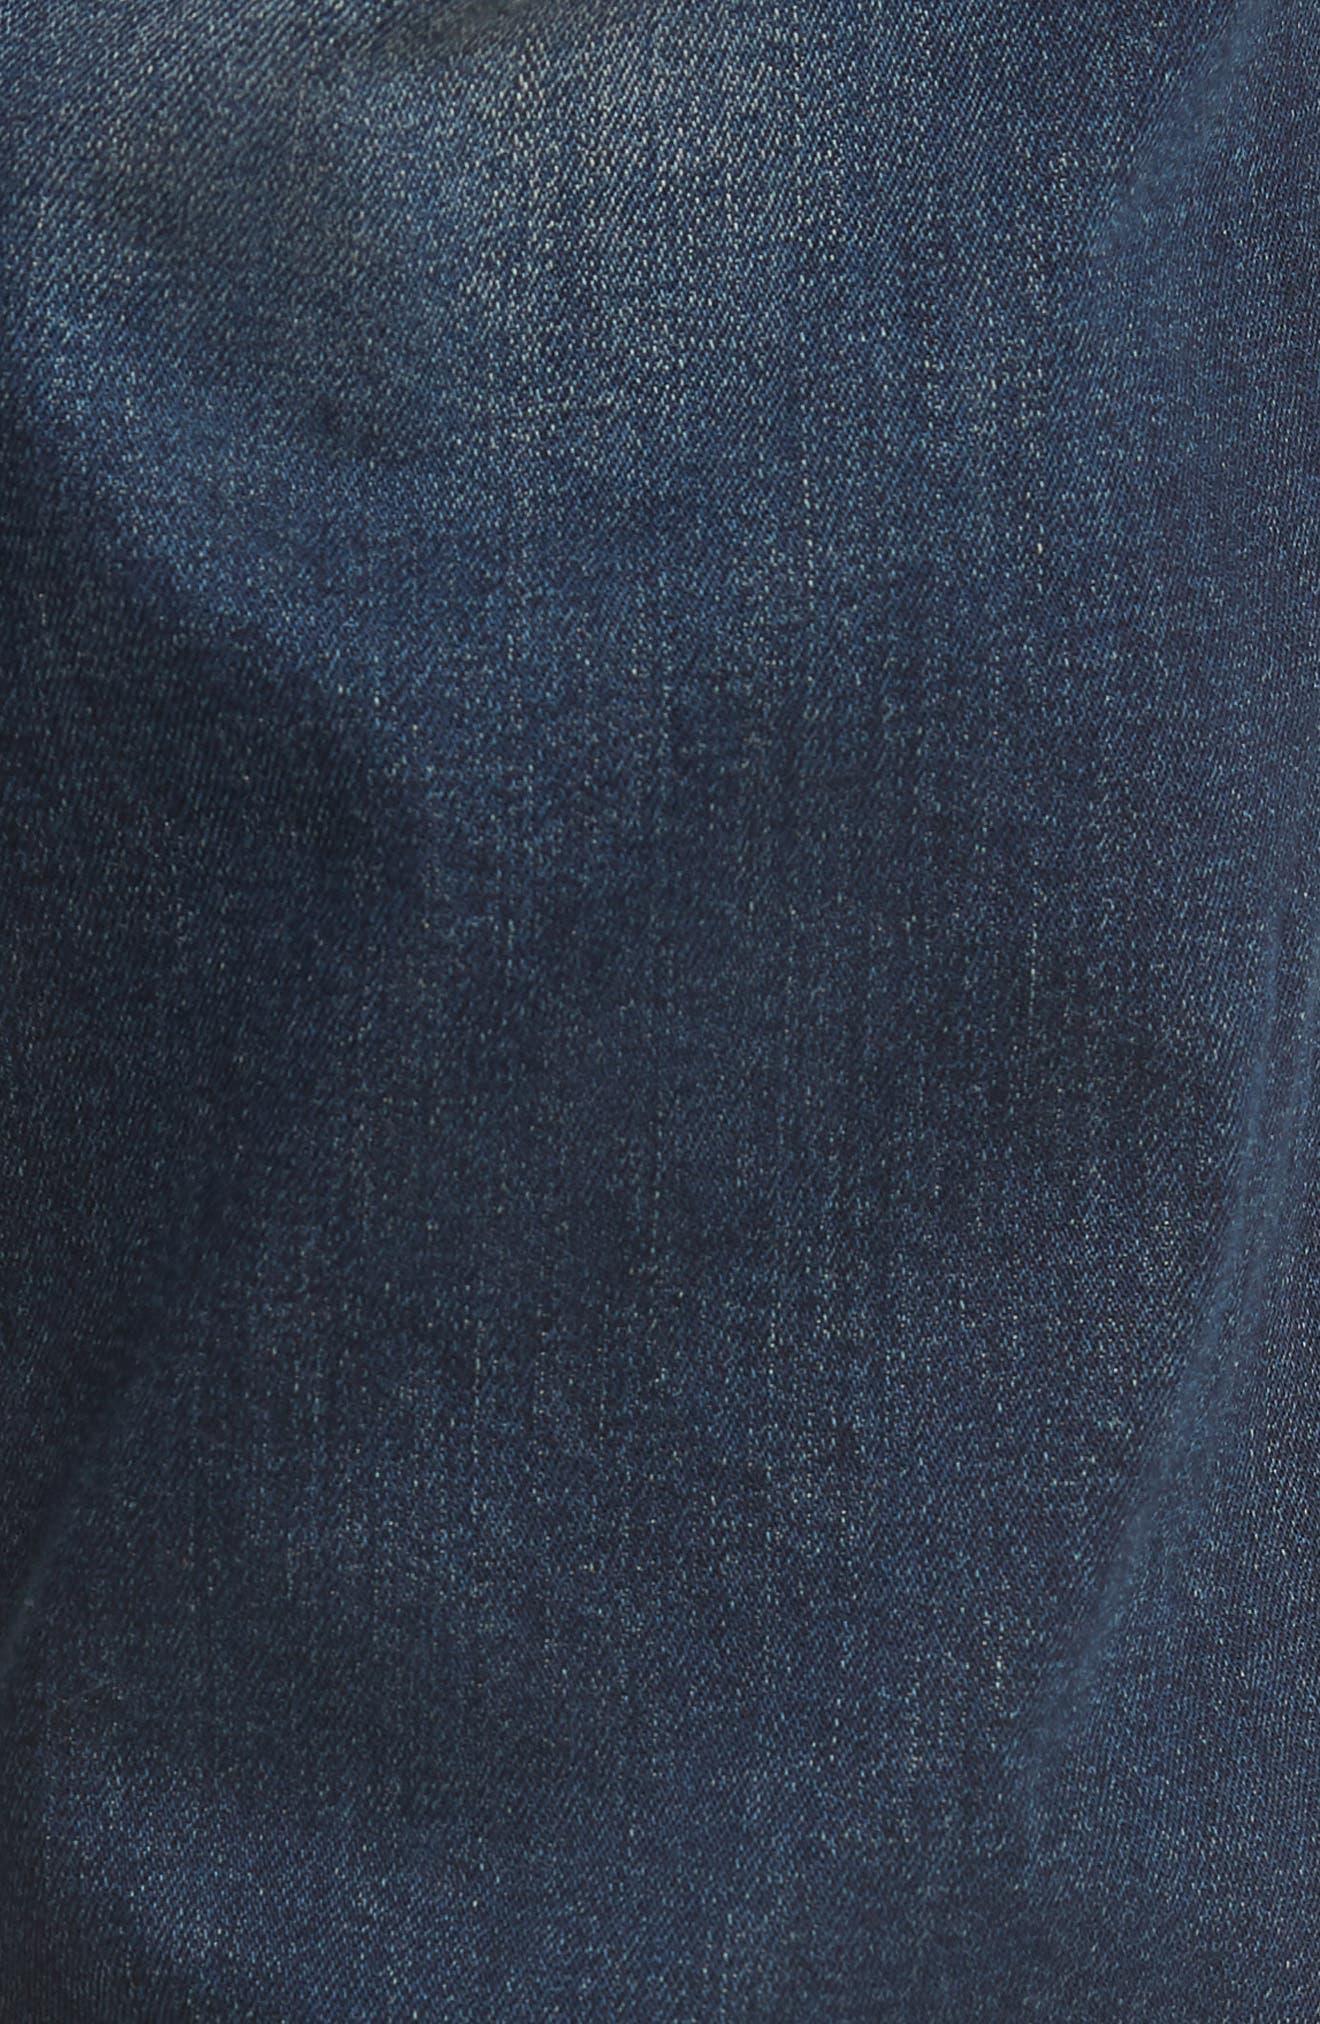 Delaware Slim Fit Jeans,                             Alternate thumbnail 5, color,                             418